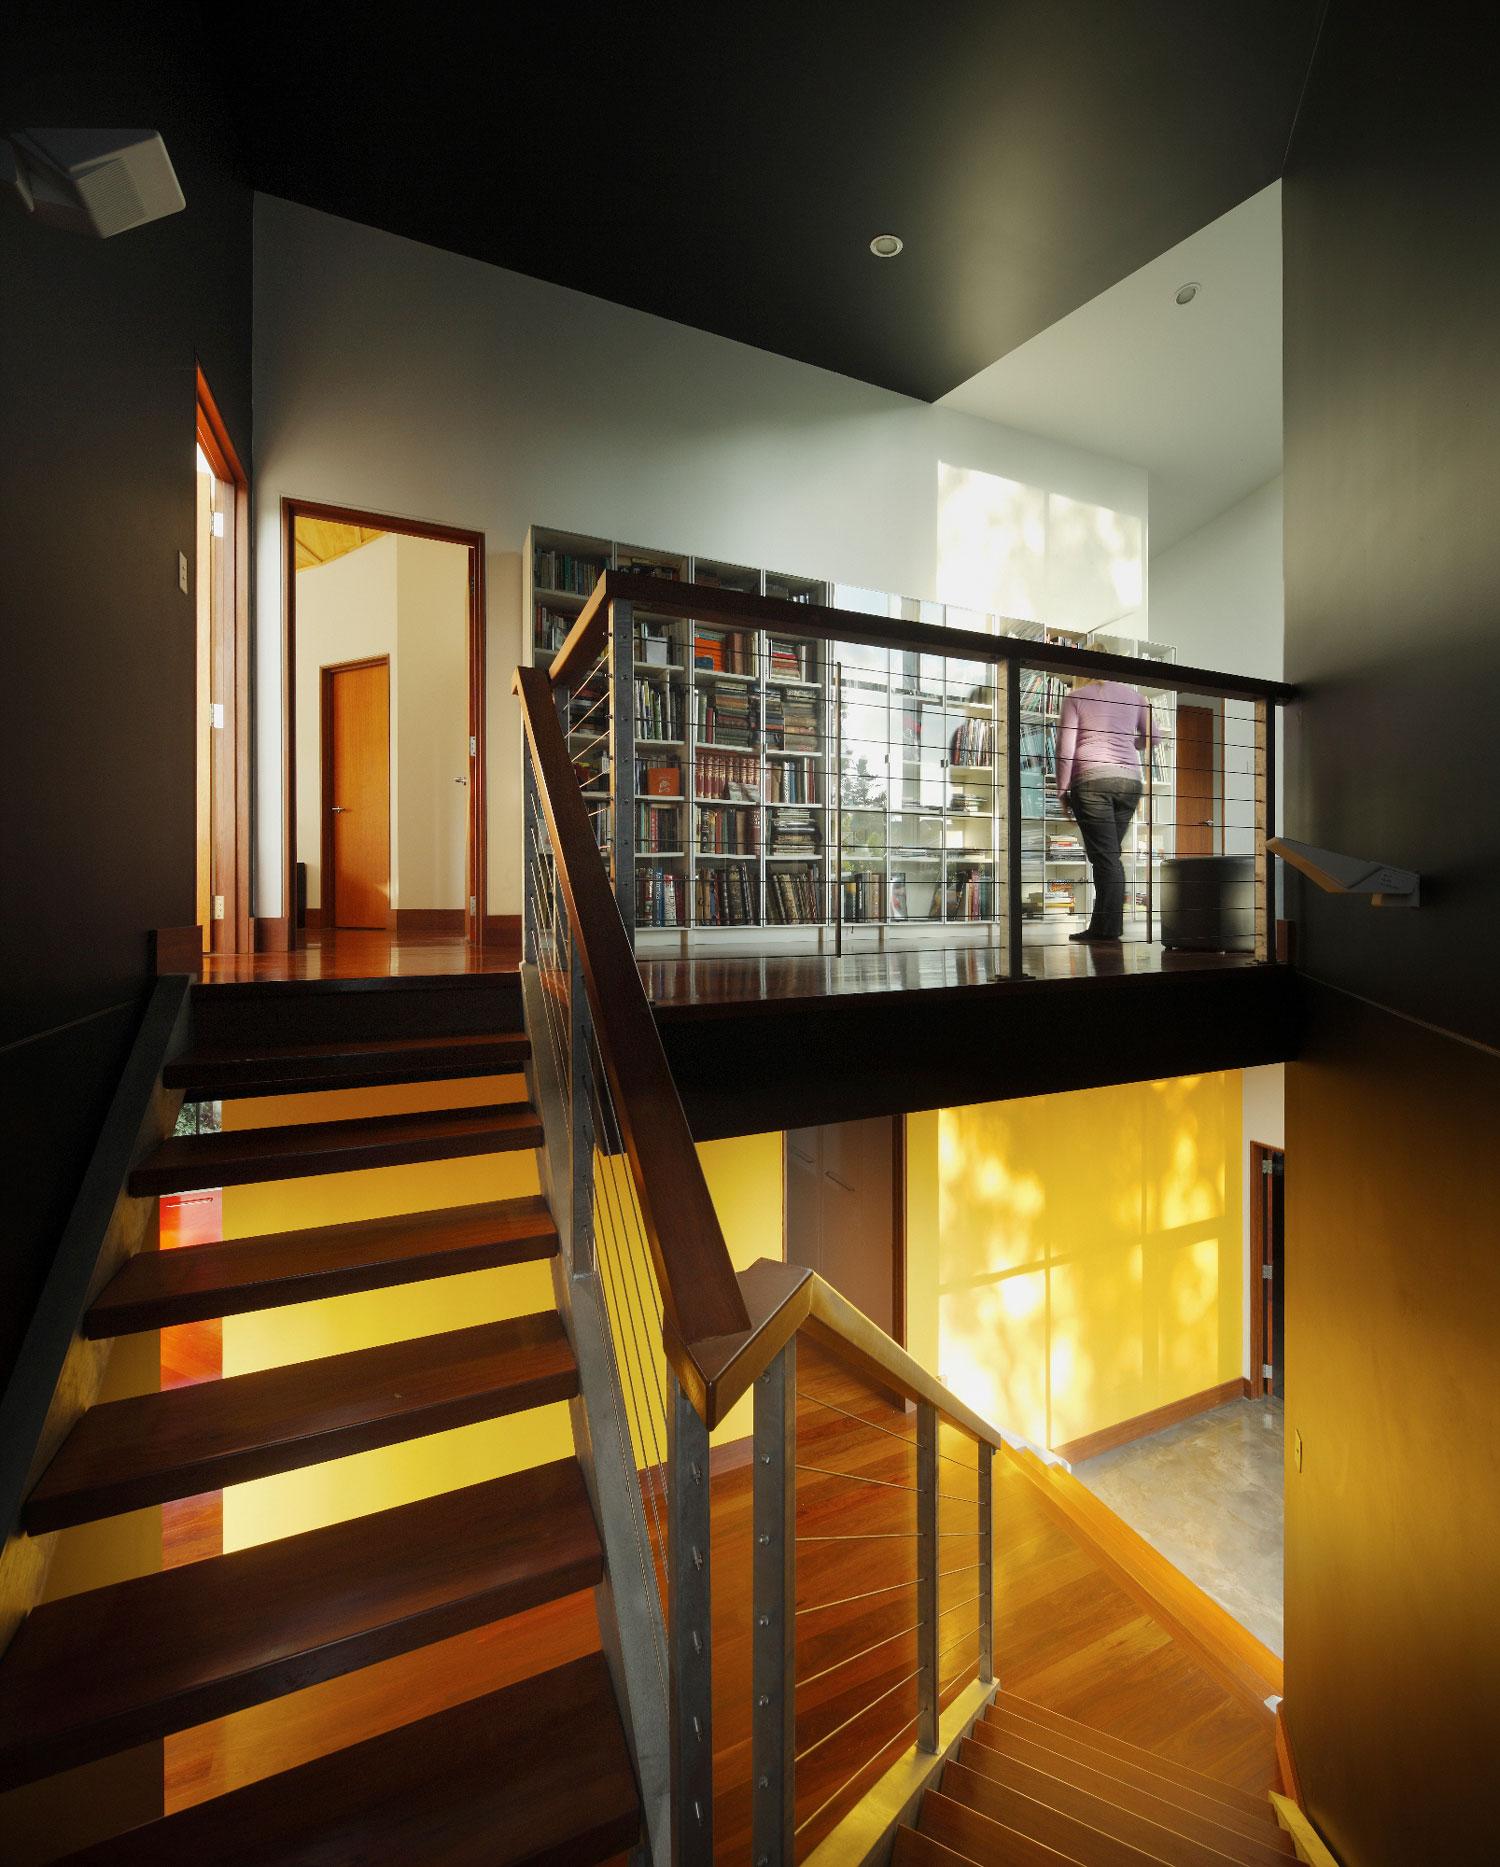 The-Gap-Residence-Guymer-Bailey-Architects-08.jpg